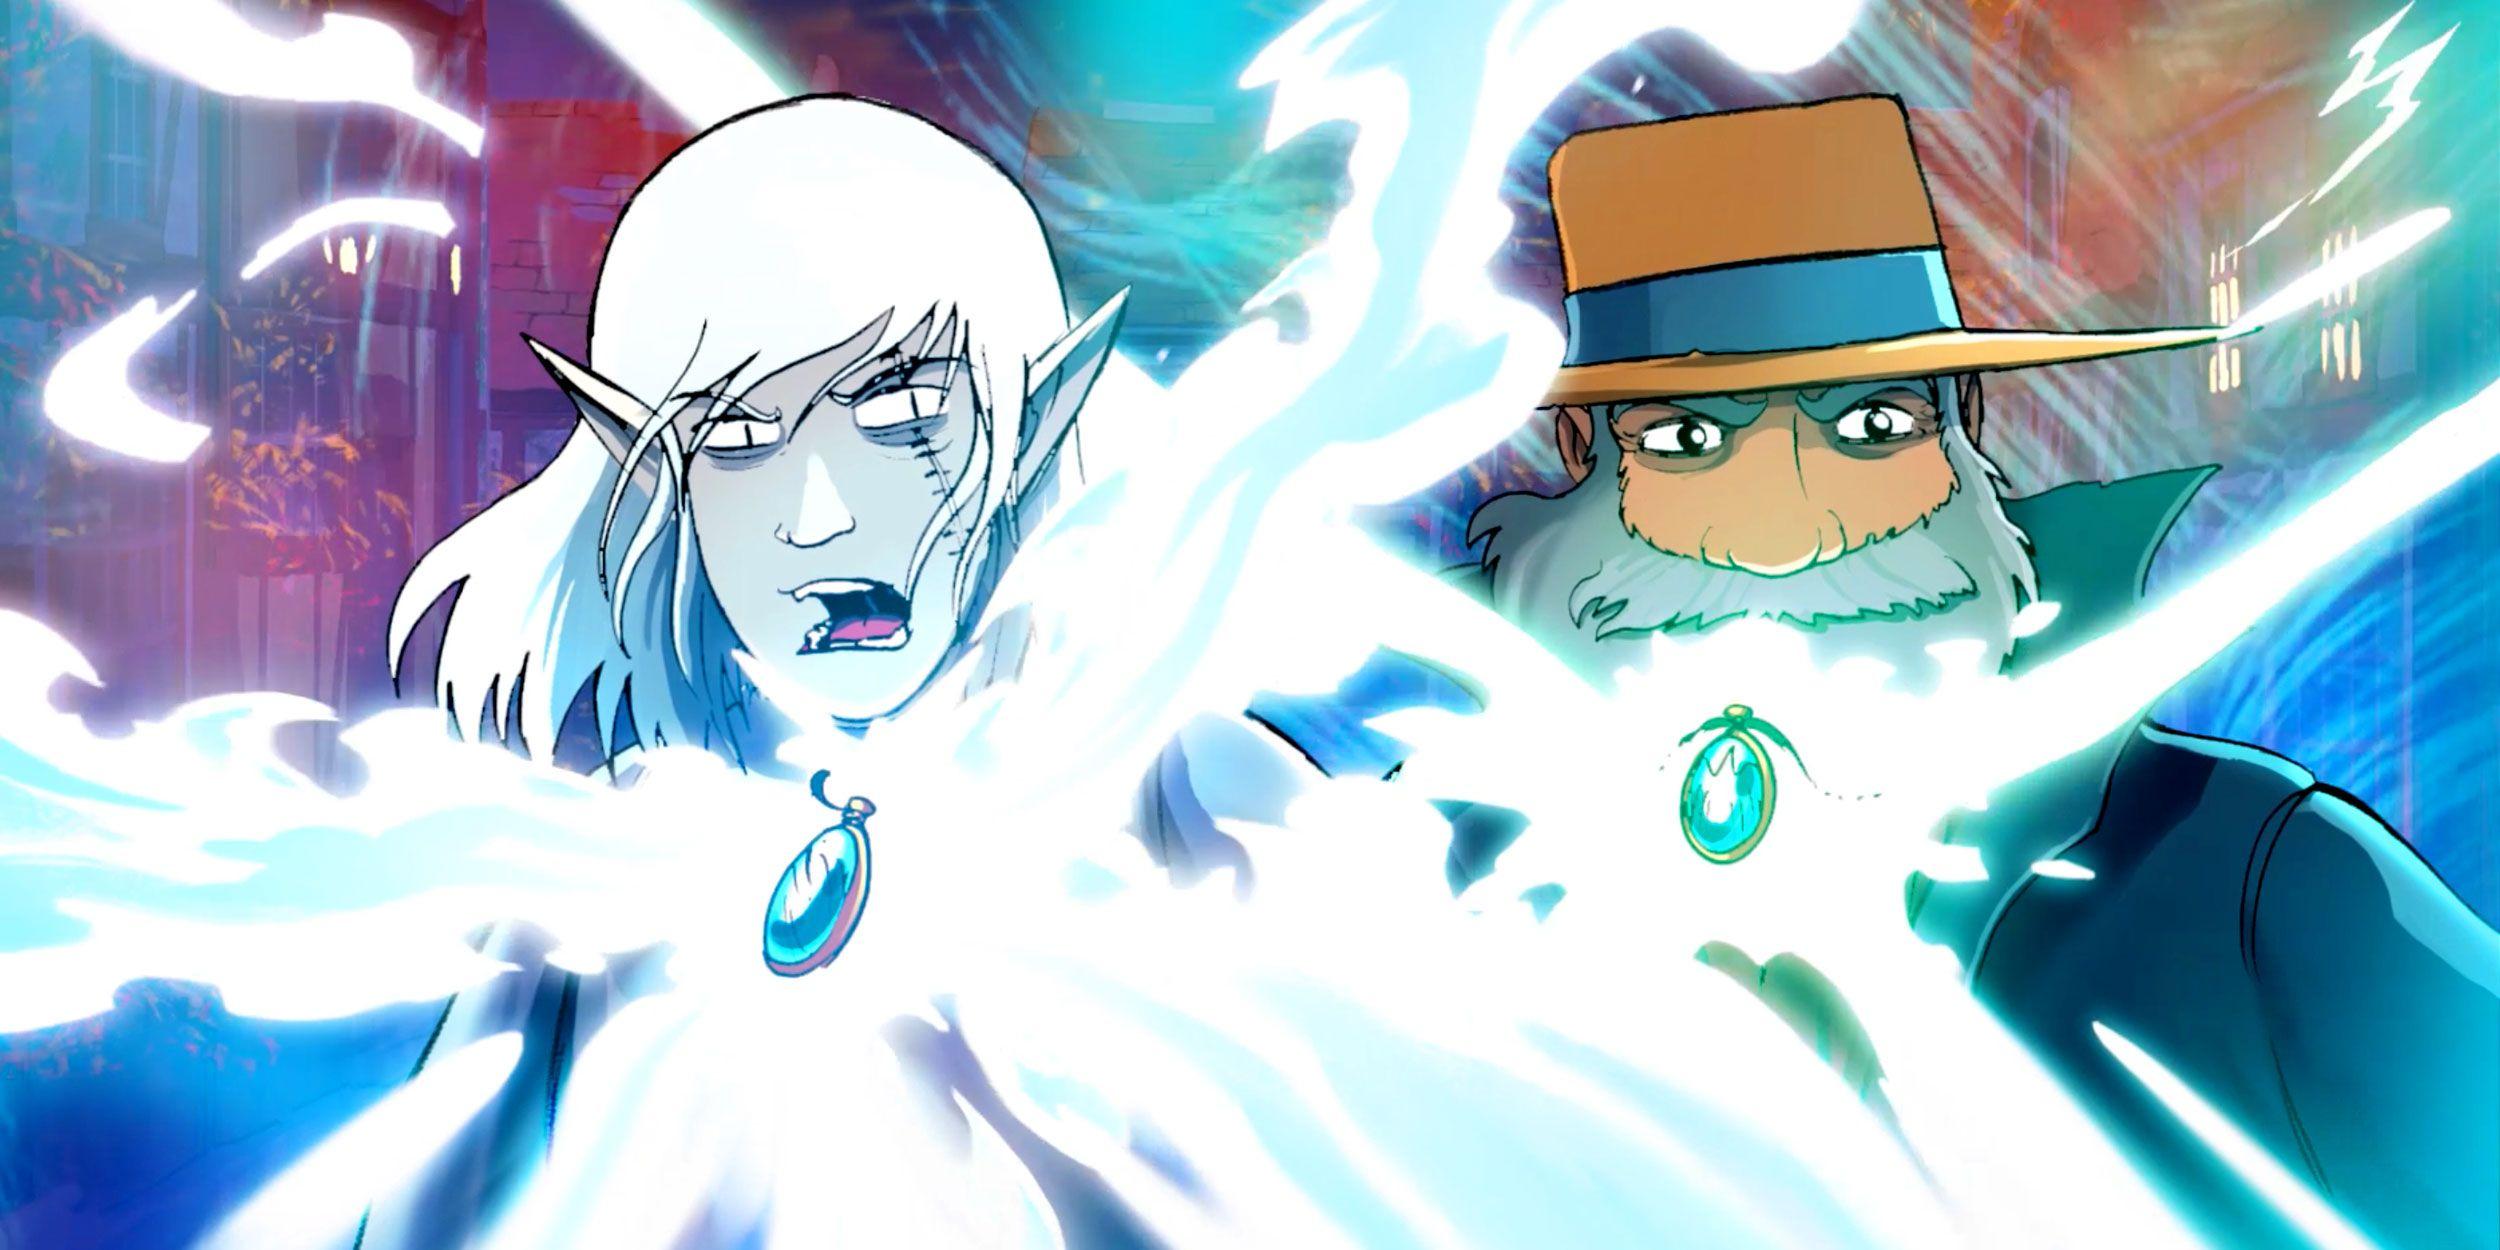 kazu kibuishi shares the first trailer for amulet  supernova